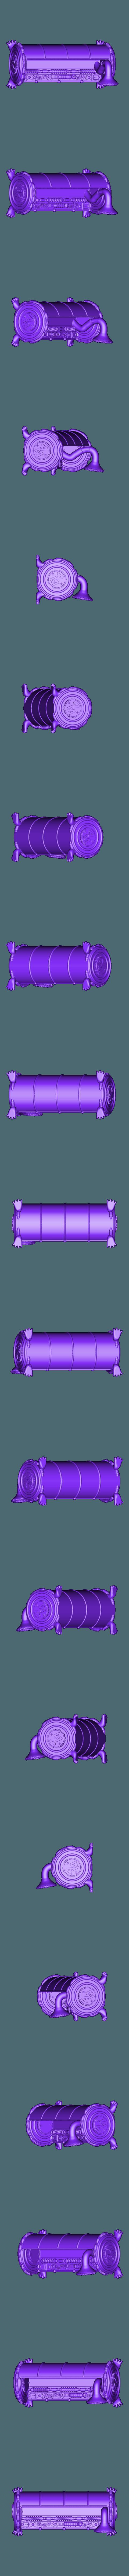 Steampunk_Support_Mobil_Alphonse_Marcel.stl Download STL file Steampunk support mobil. • 3D print template, Alphonse_Marcel